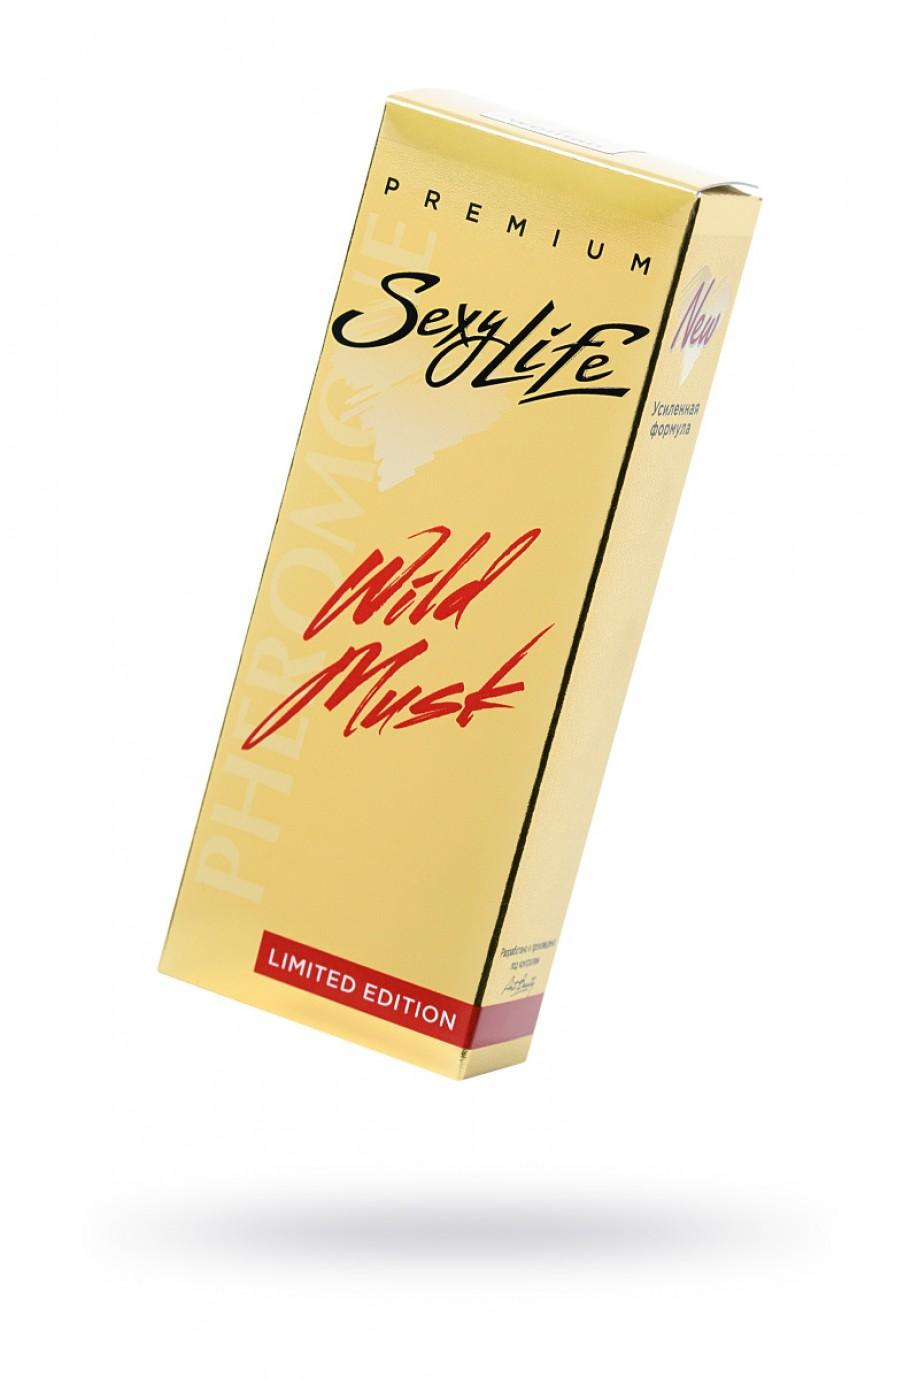 Духи с феромонами Wild Musk №15 философия аромата Tom Ford - Black Orchid, женские, 10 мл